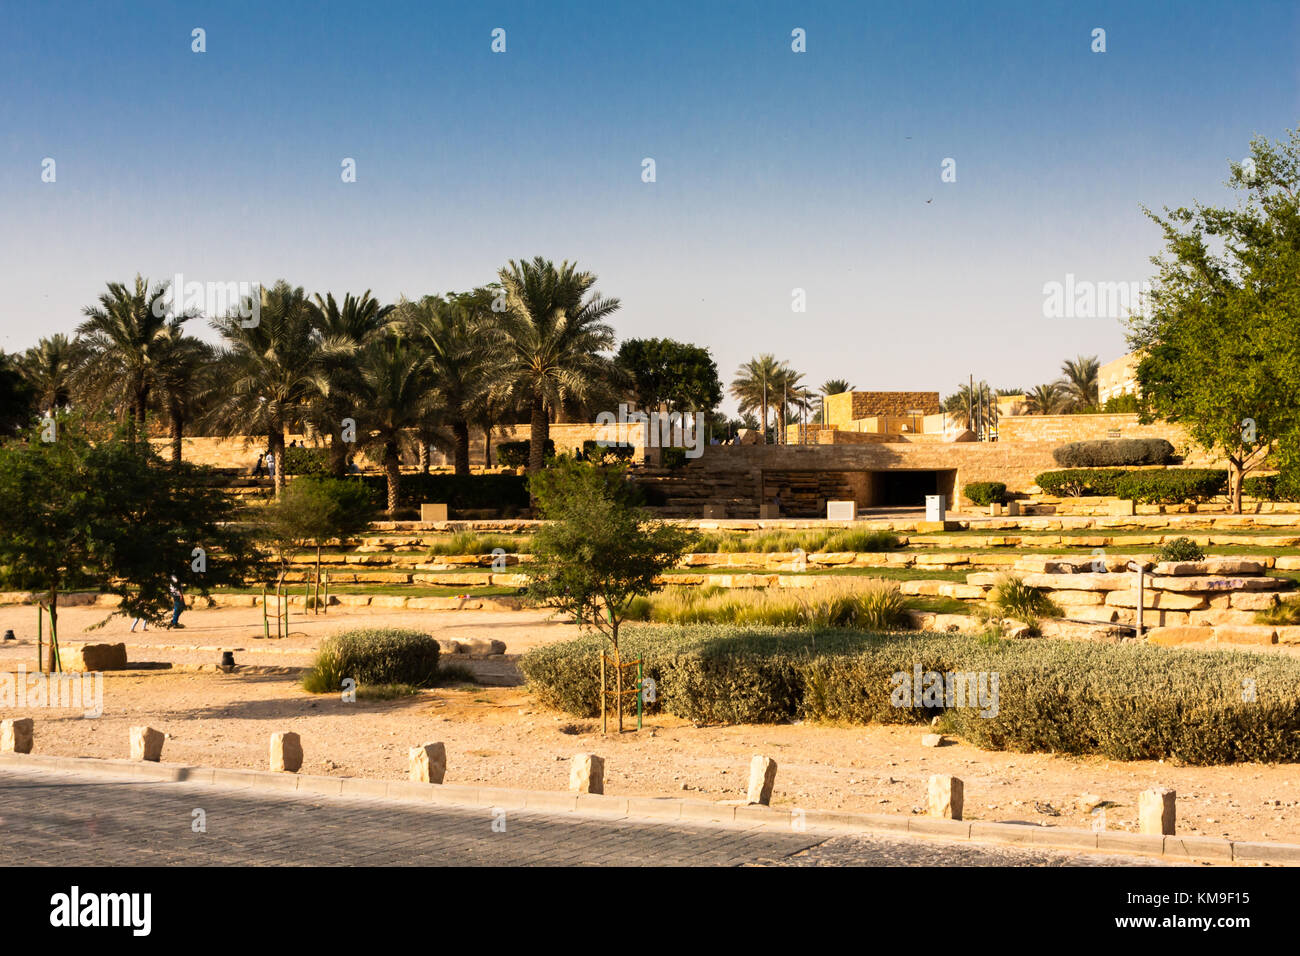 Parque Diriyah, Riyadh, Arabia Saudita Imagen De Stock